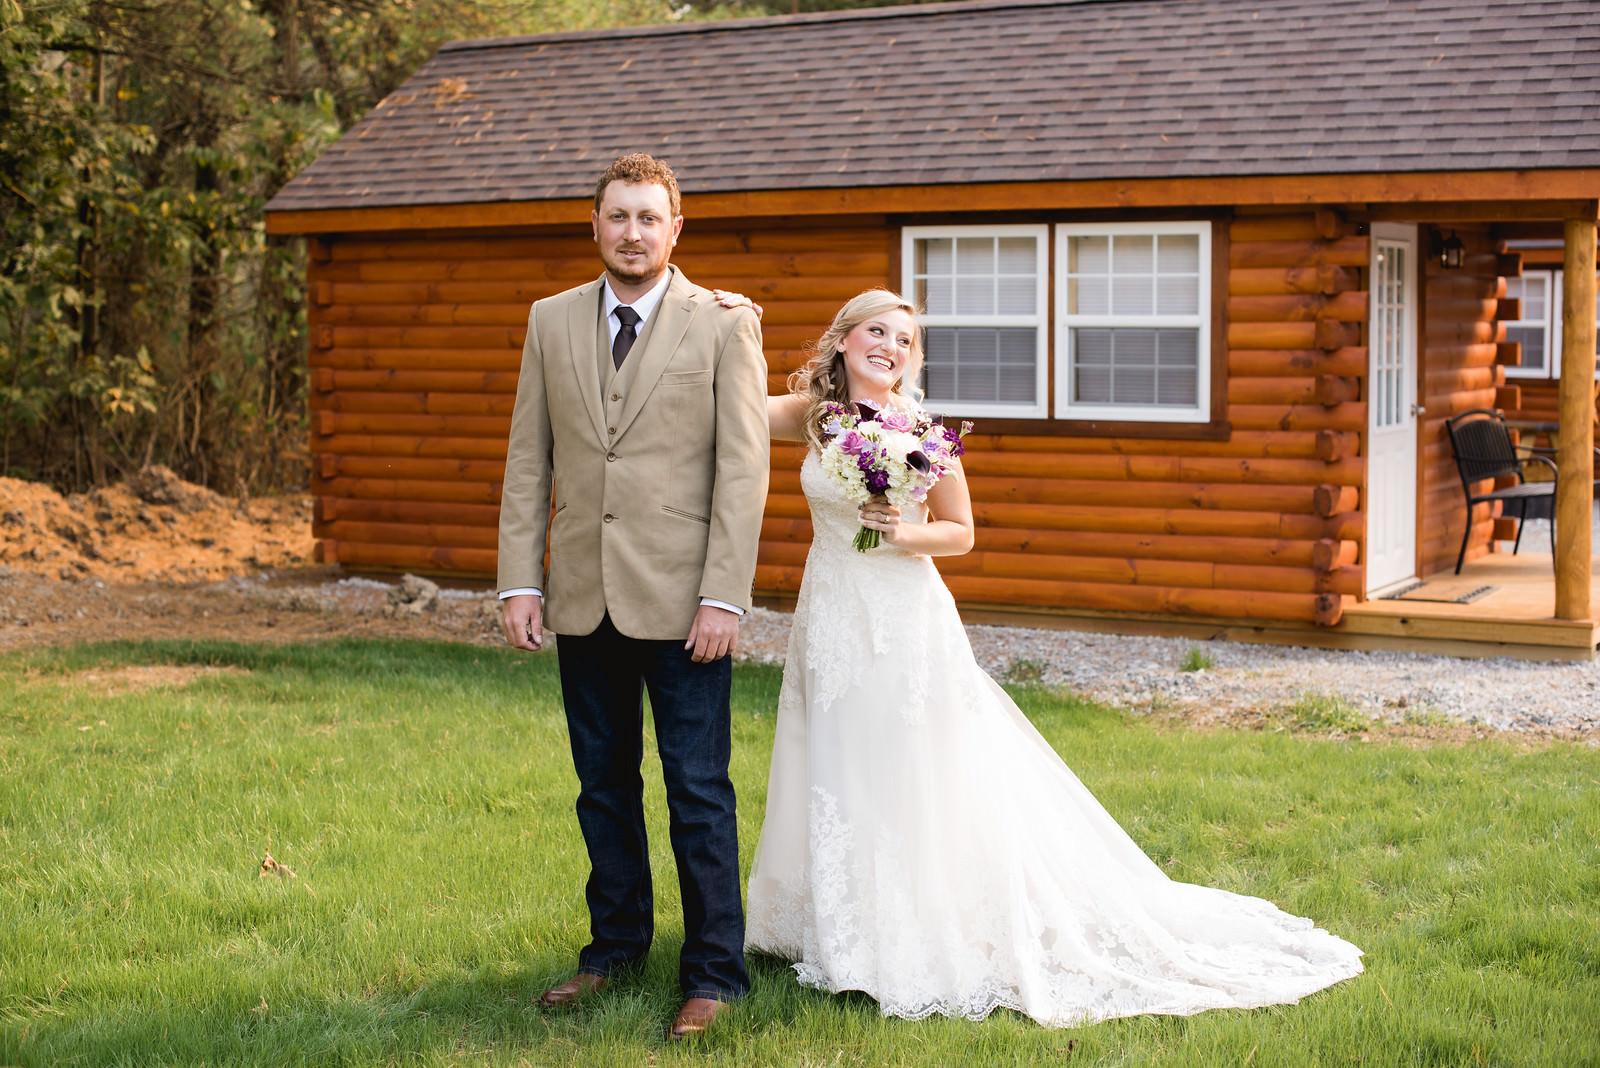 first_look_on_wedding_day1.jpg